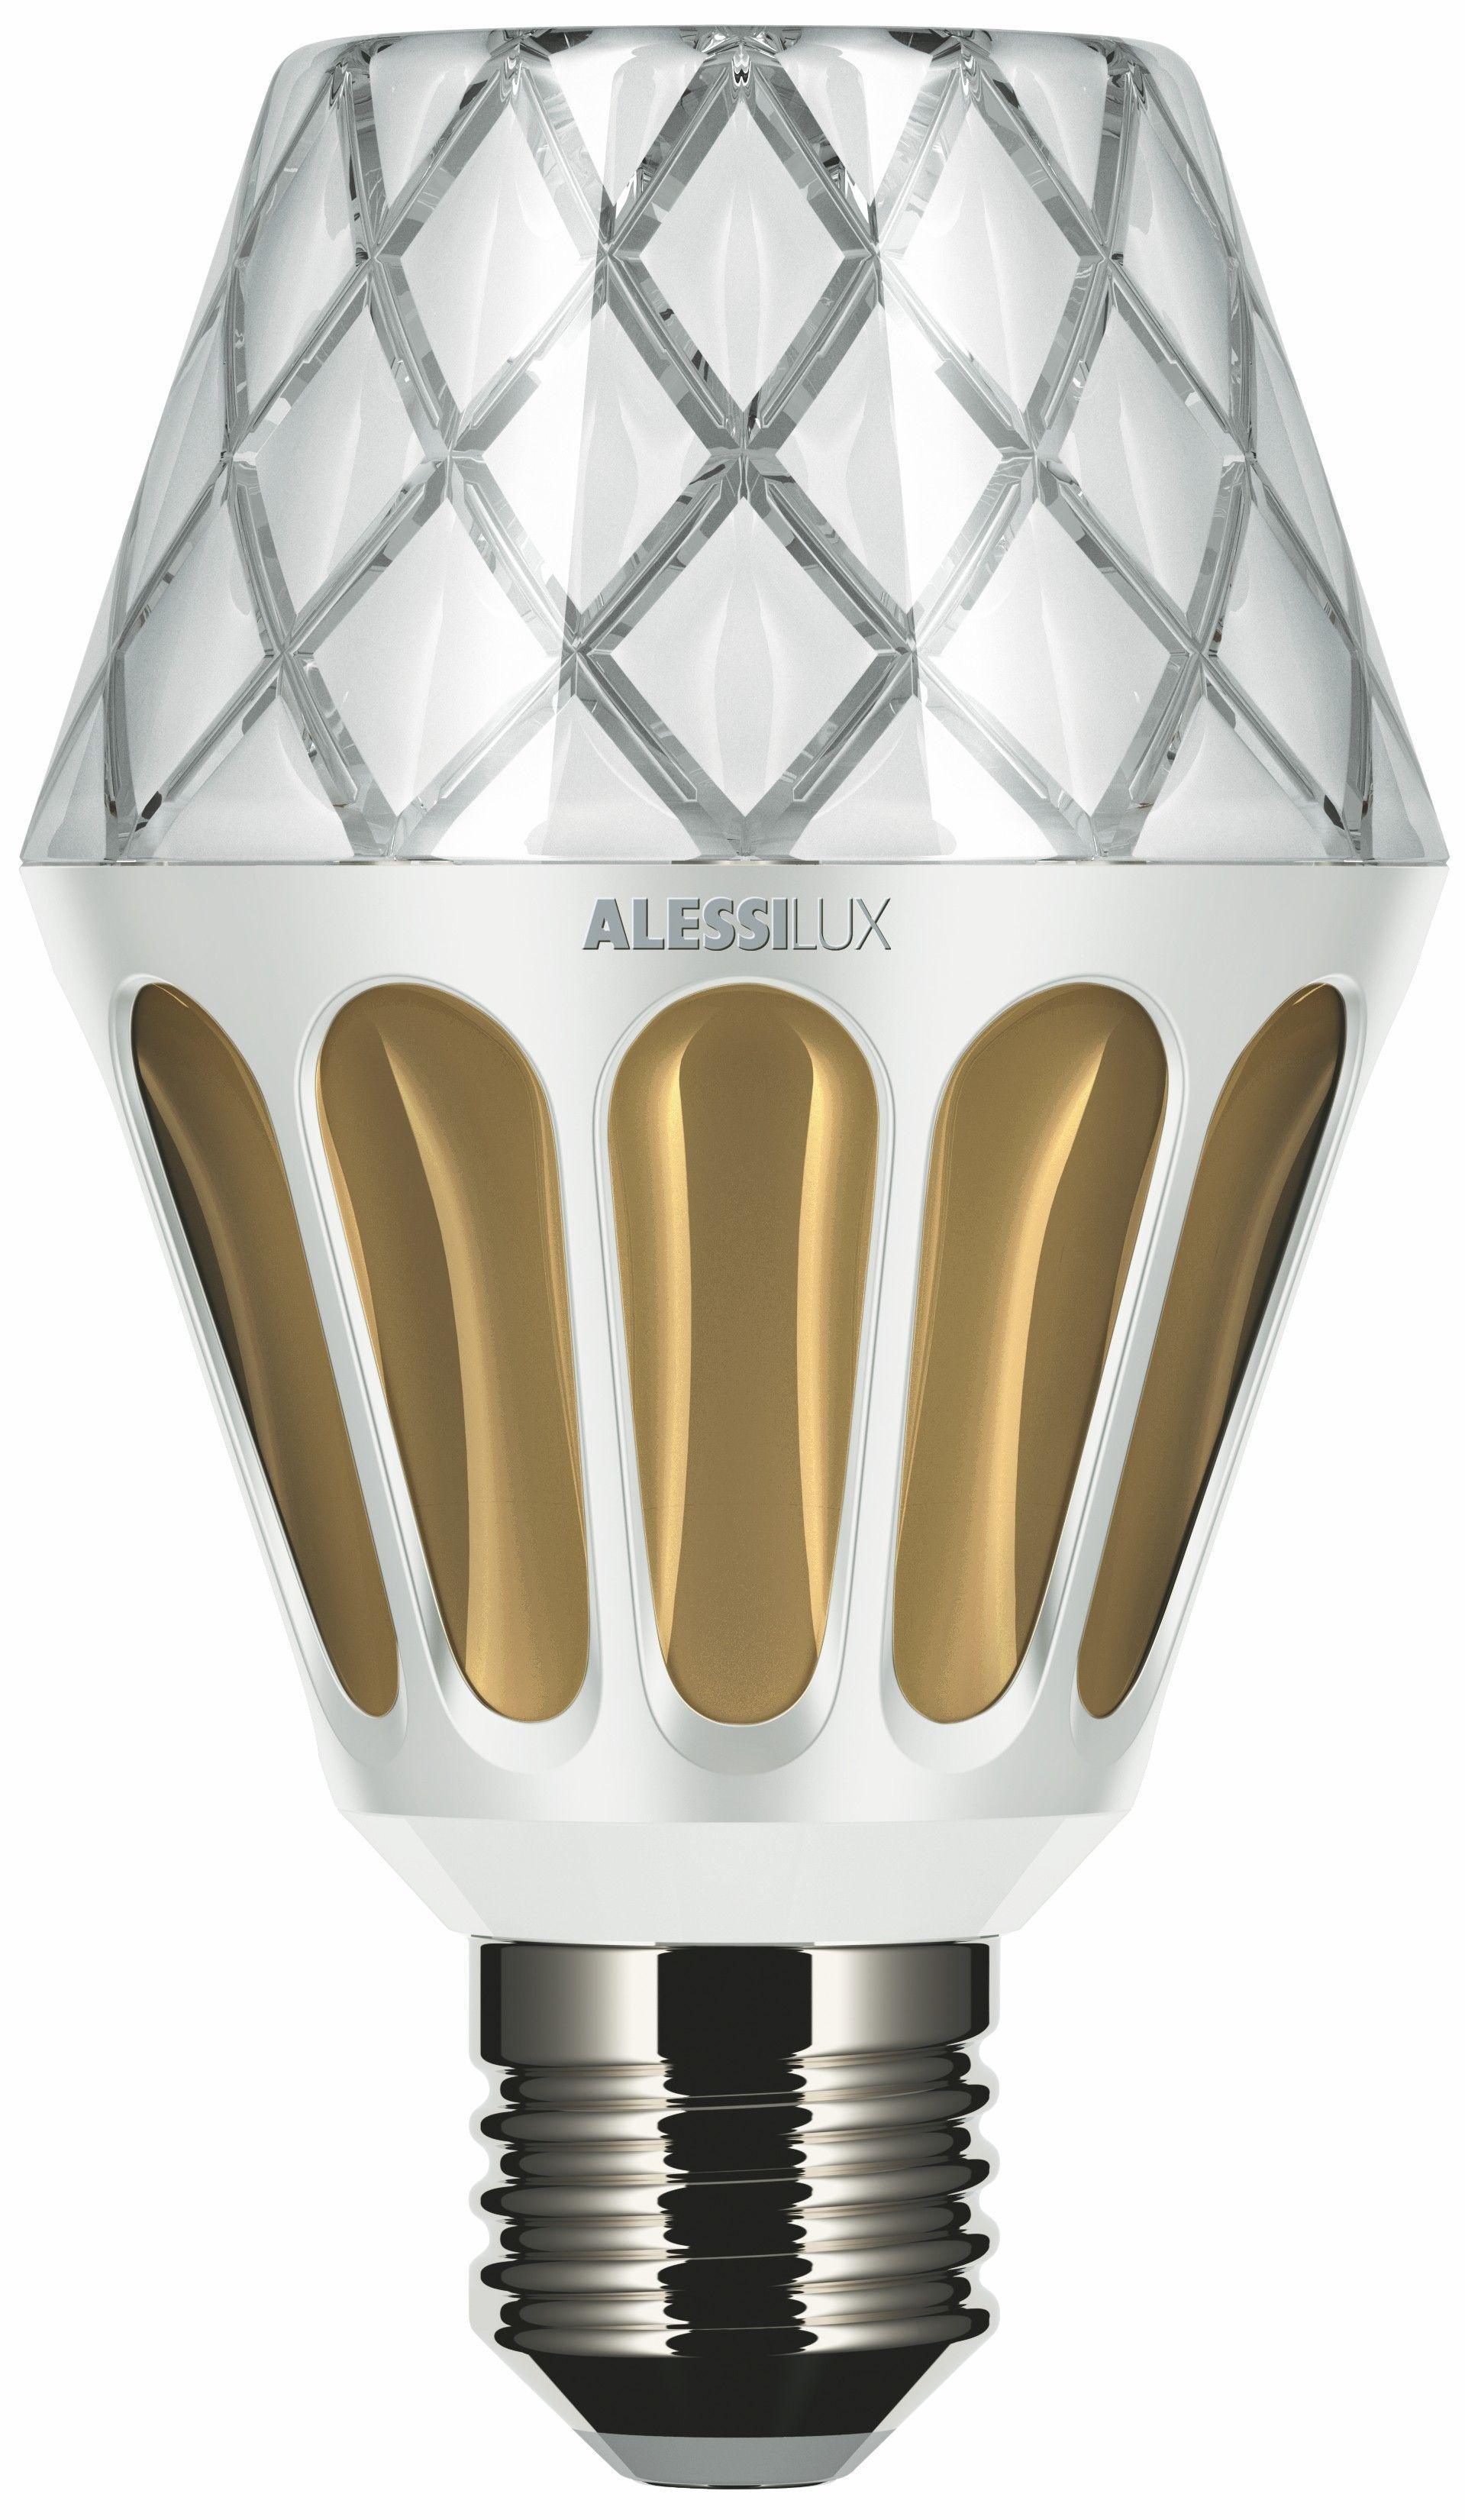 1000 images about lightbulb things on pinterest lightbulbs bulbs - Alessi Vienna Led Light Bulb 34 99